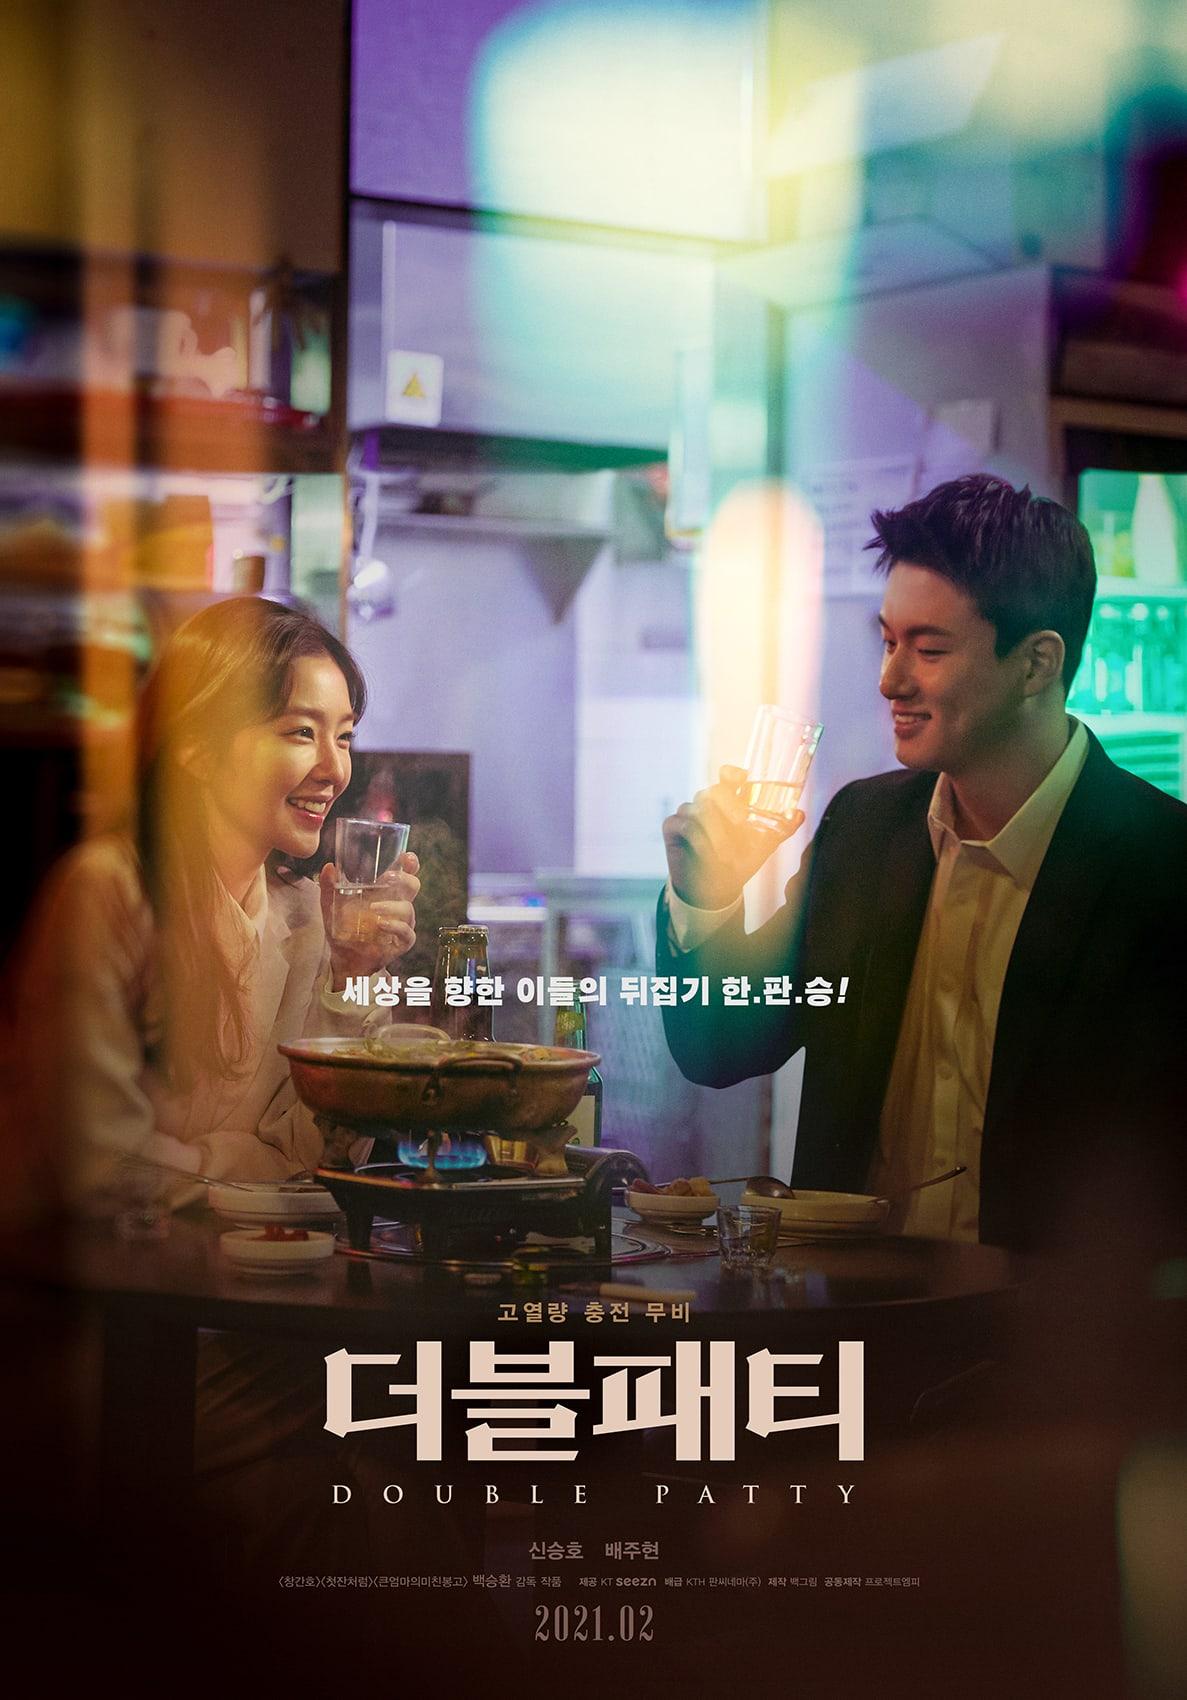 Download Film Korea Double Patty Subtitle Indonesia